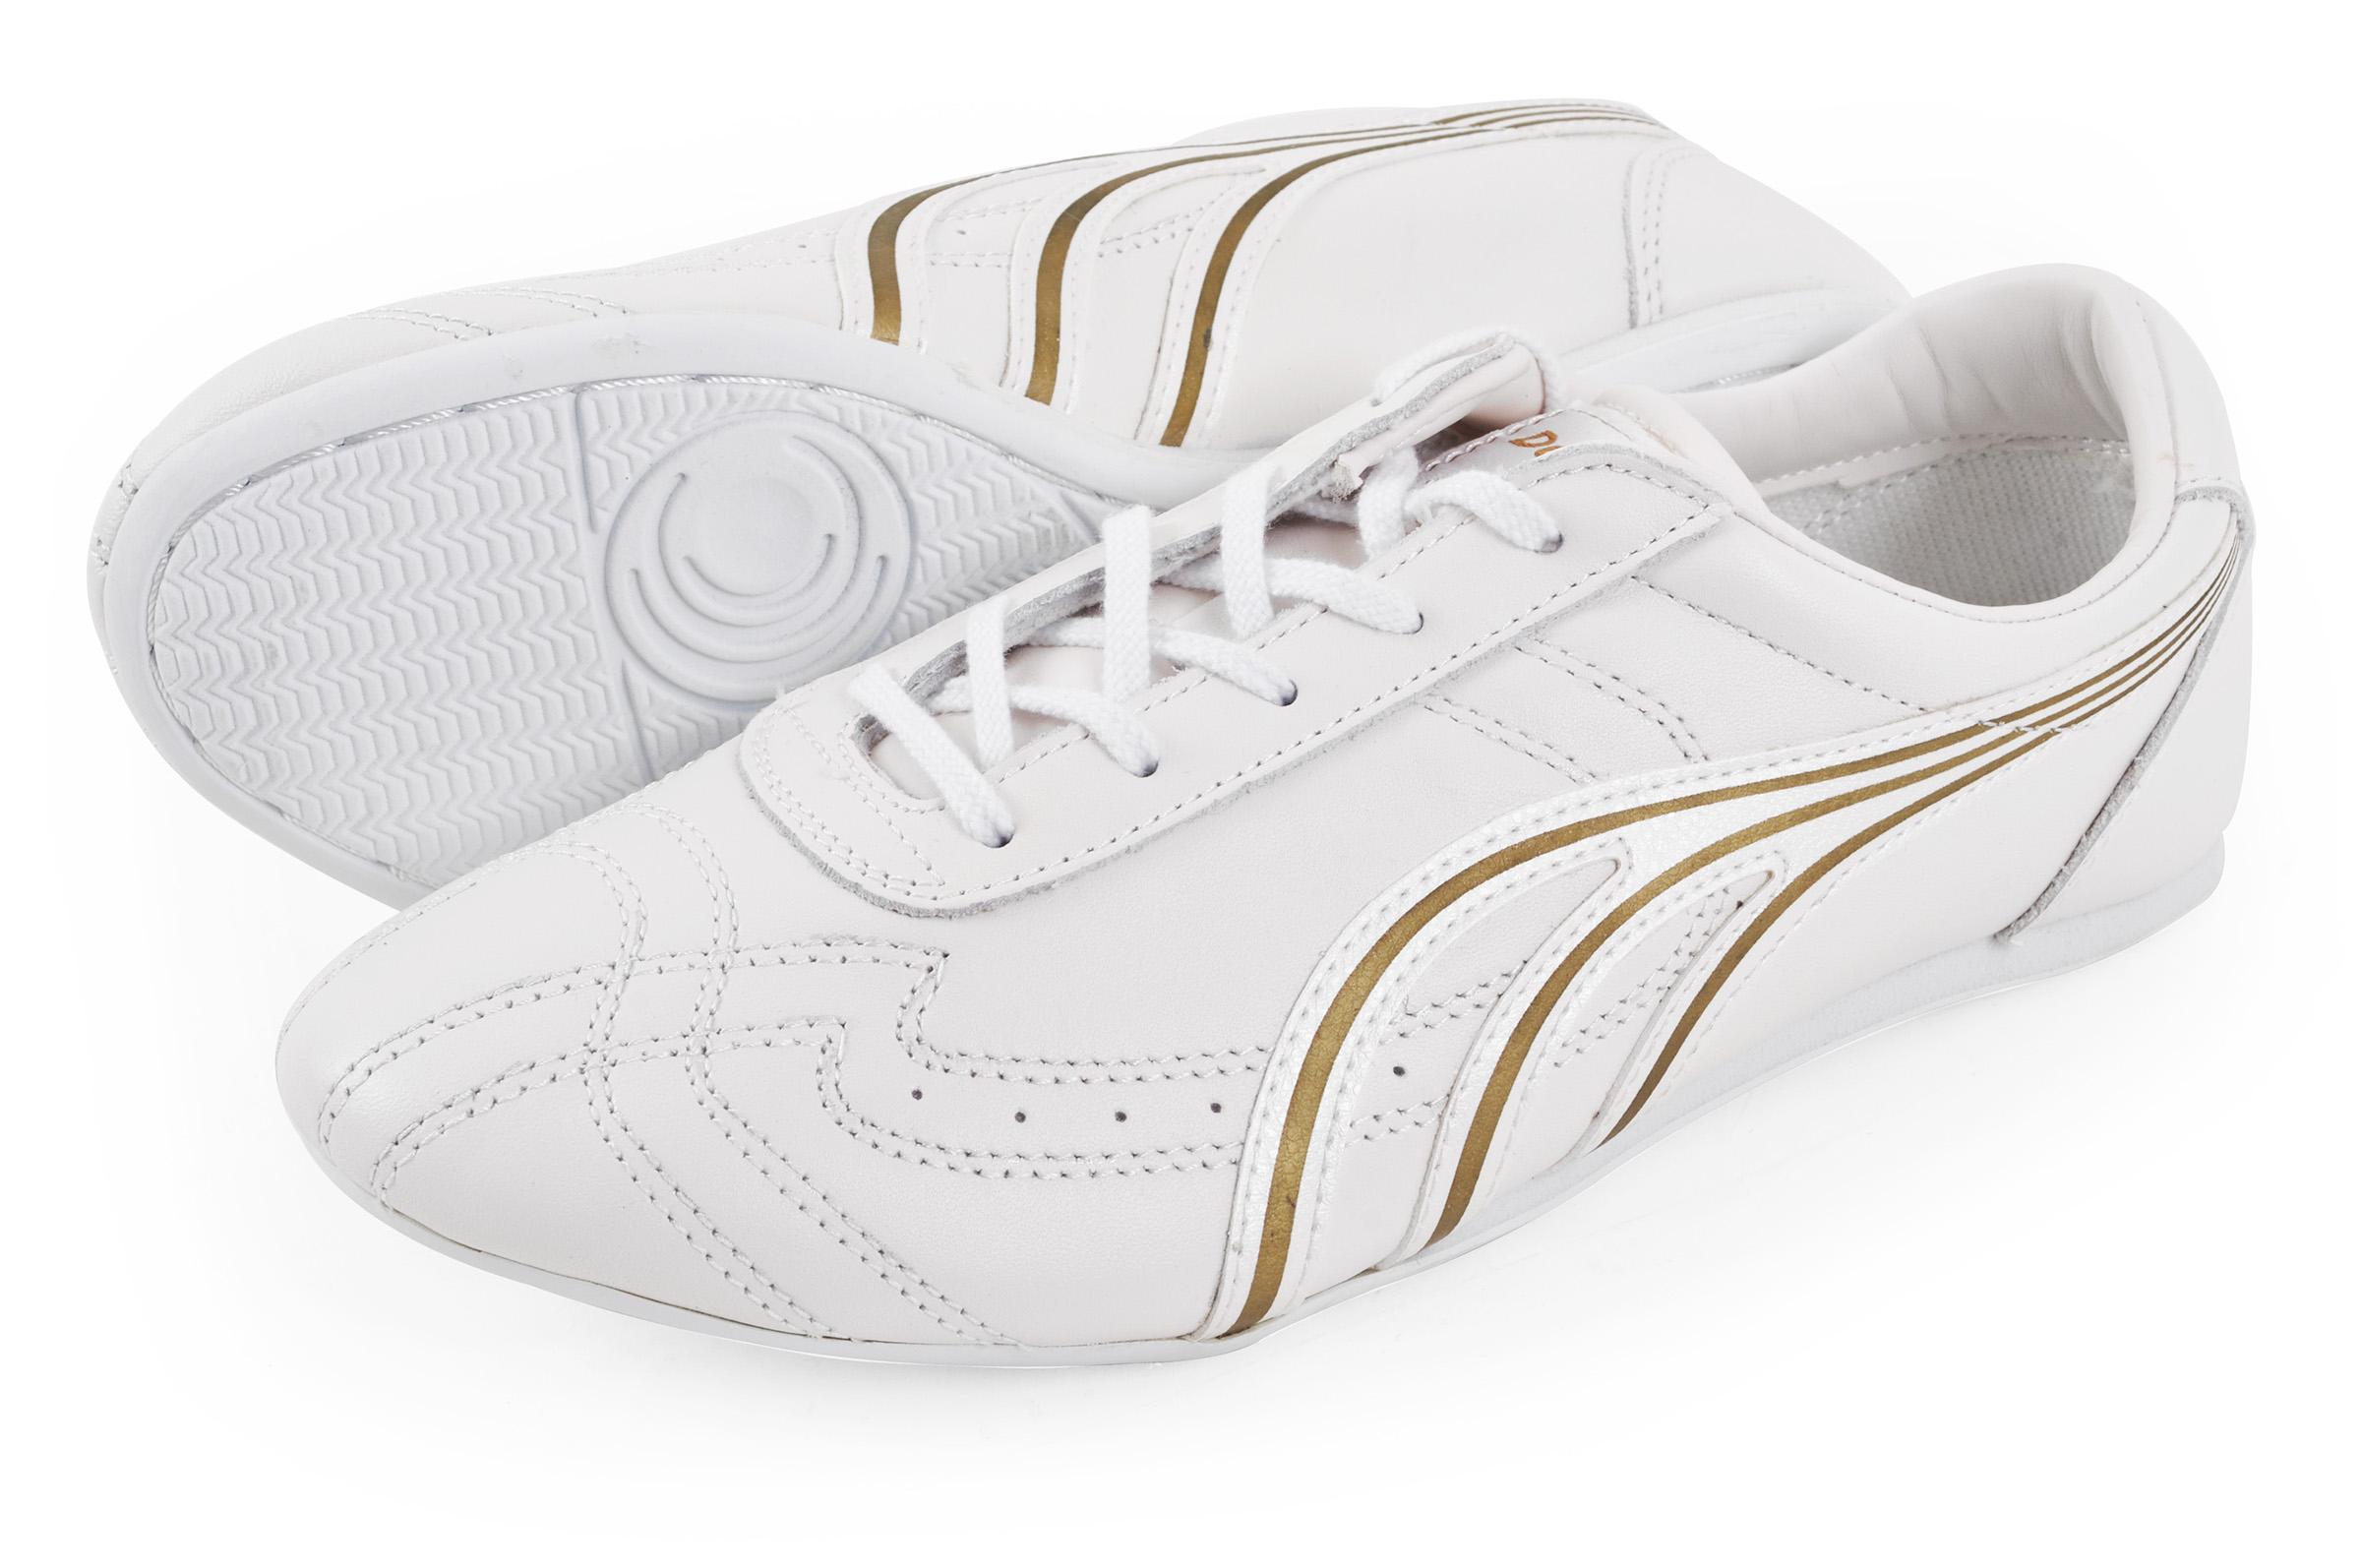 [Déstock] Chaussures Wushu Dowin